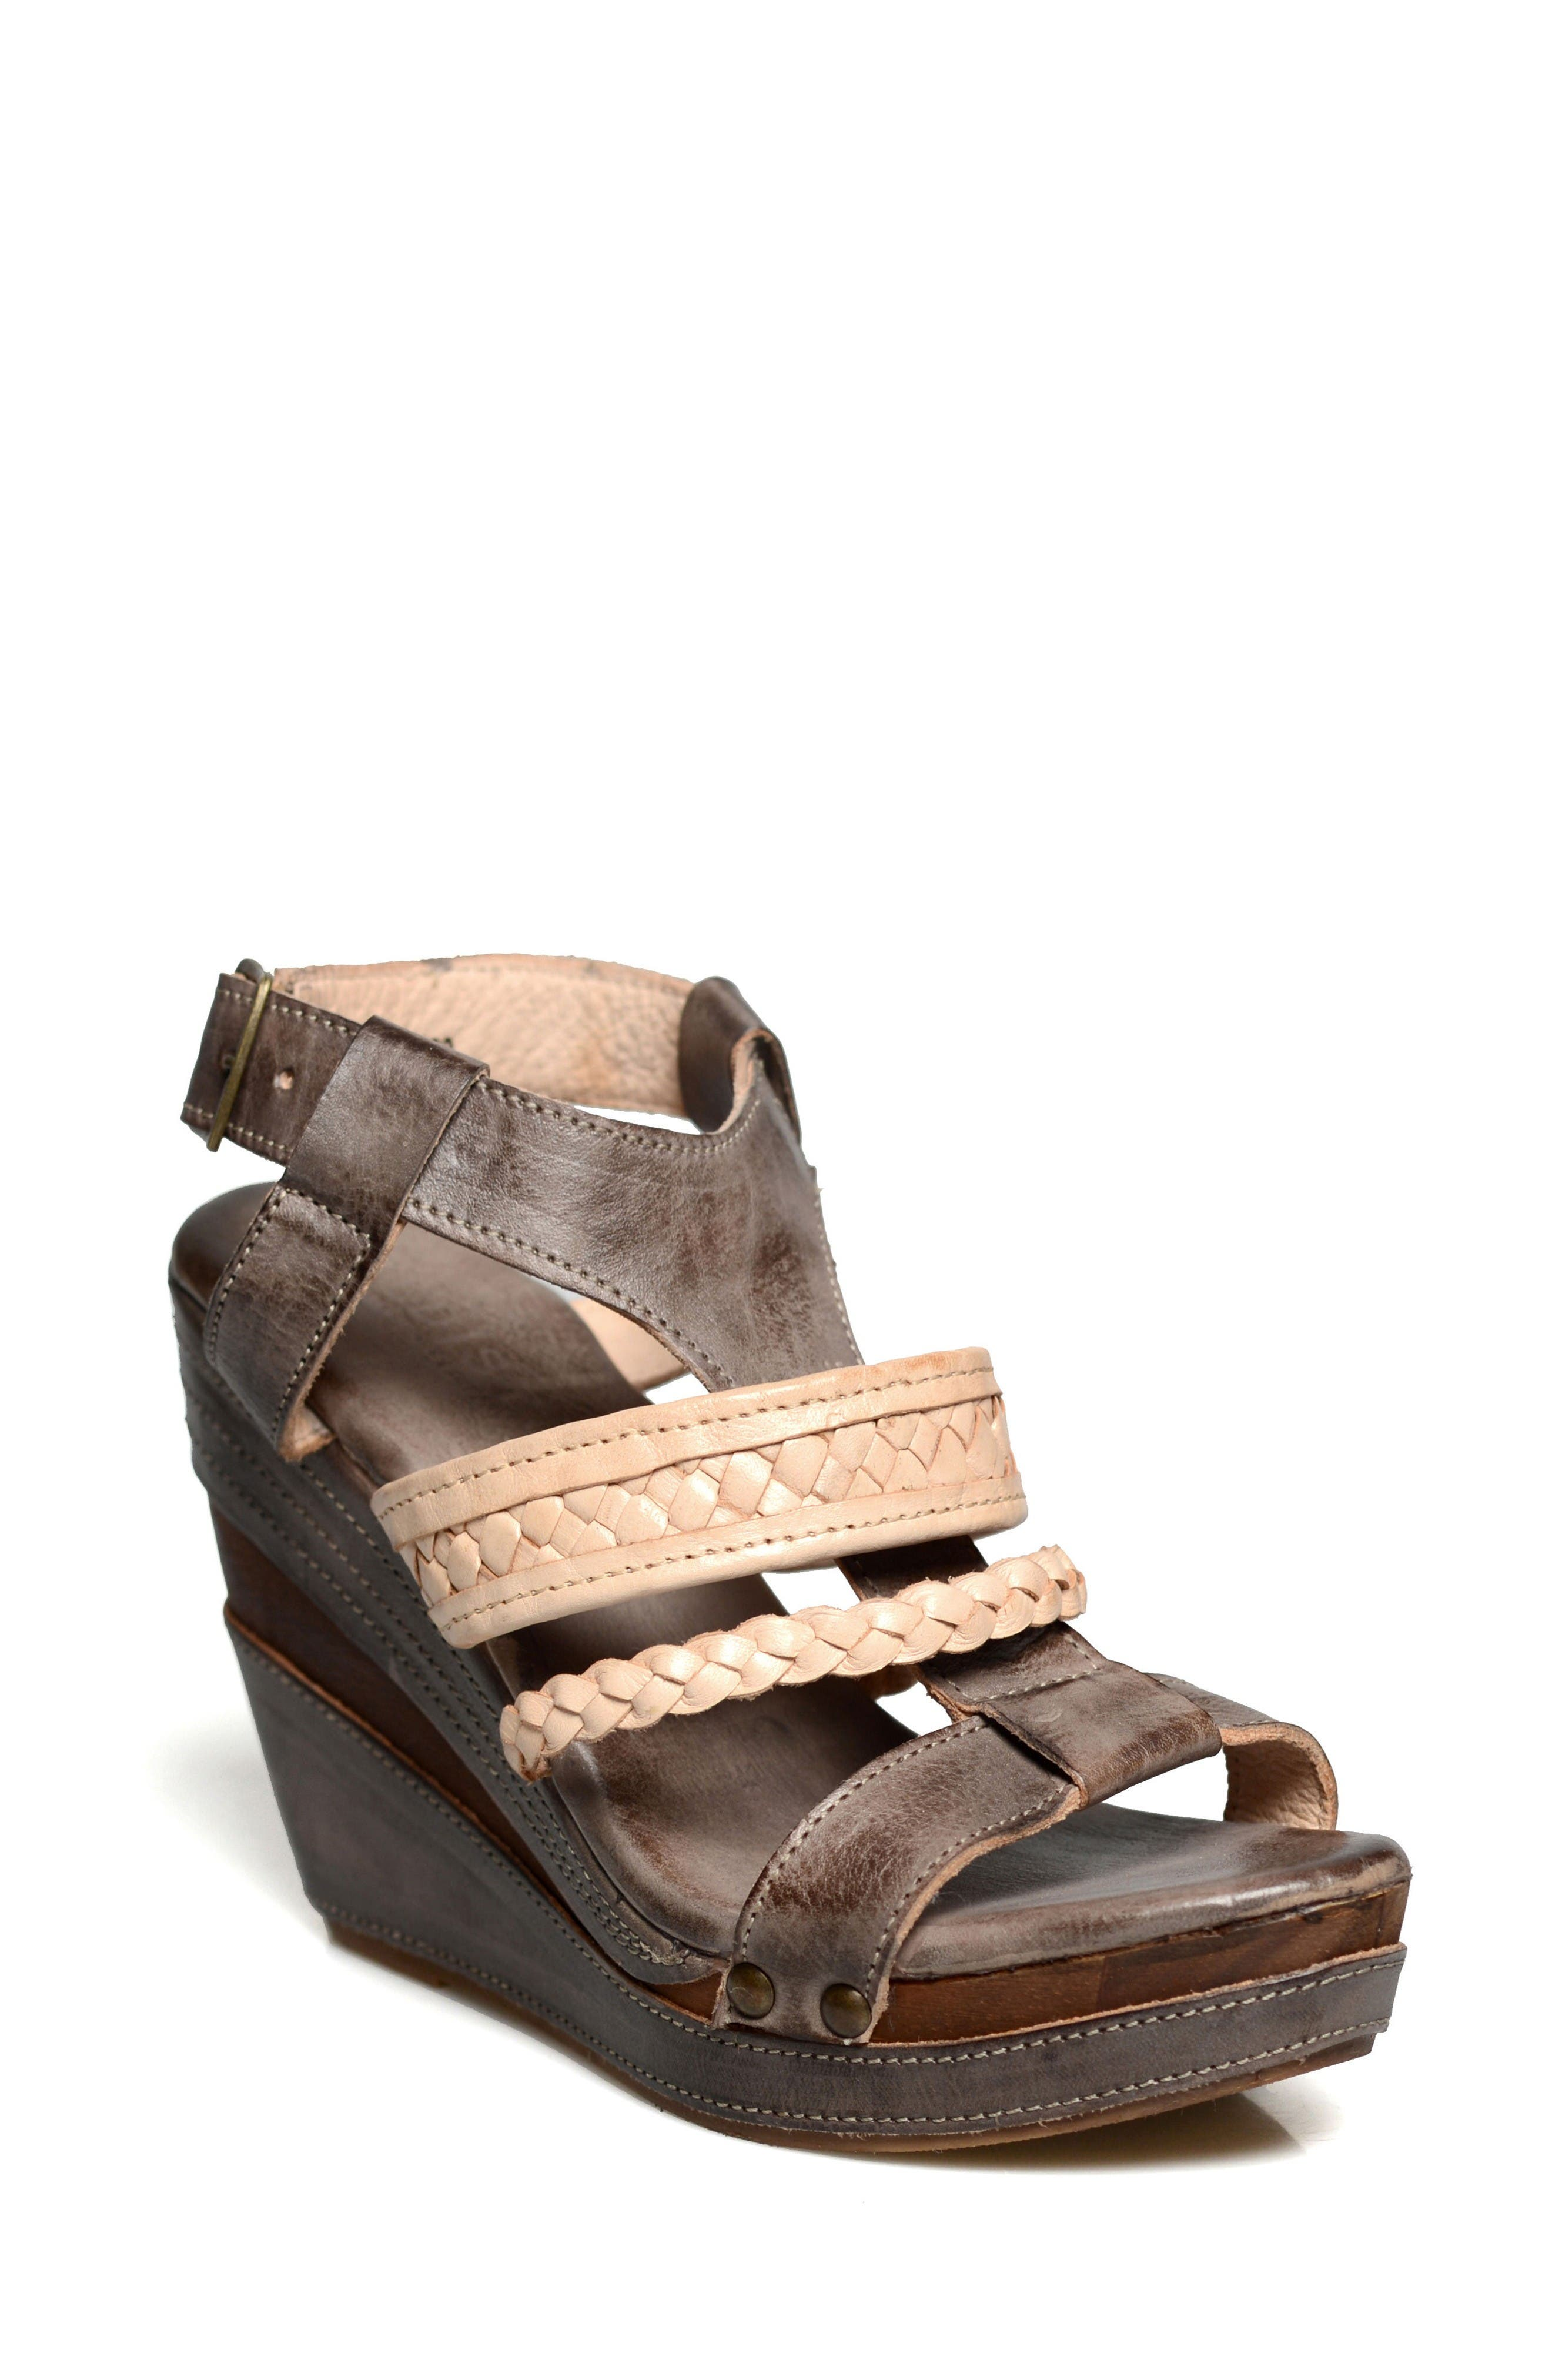 Main Image - Bed Stu Jaslyn Strappy Platform Sandal (Women)